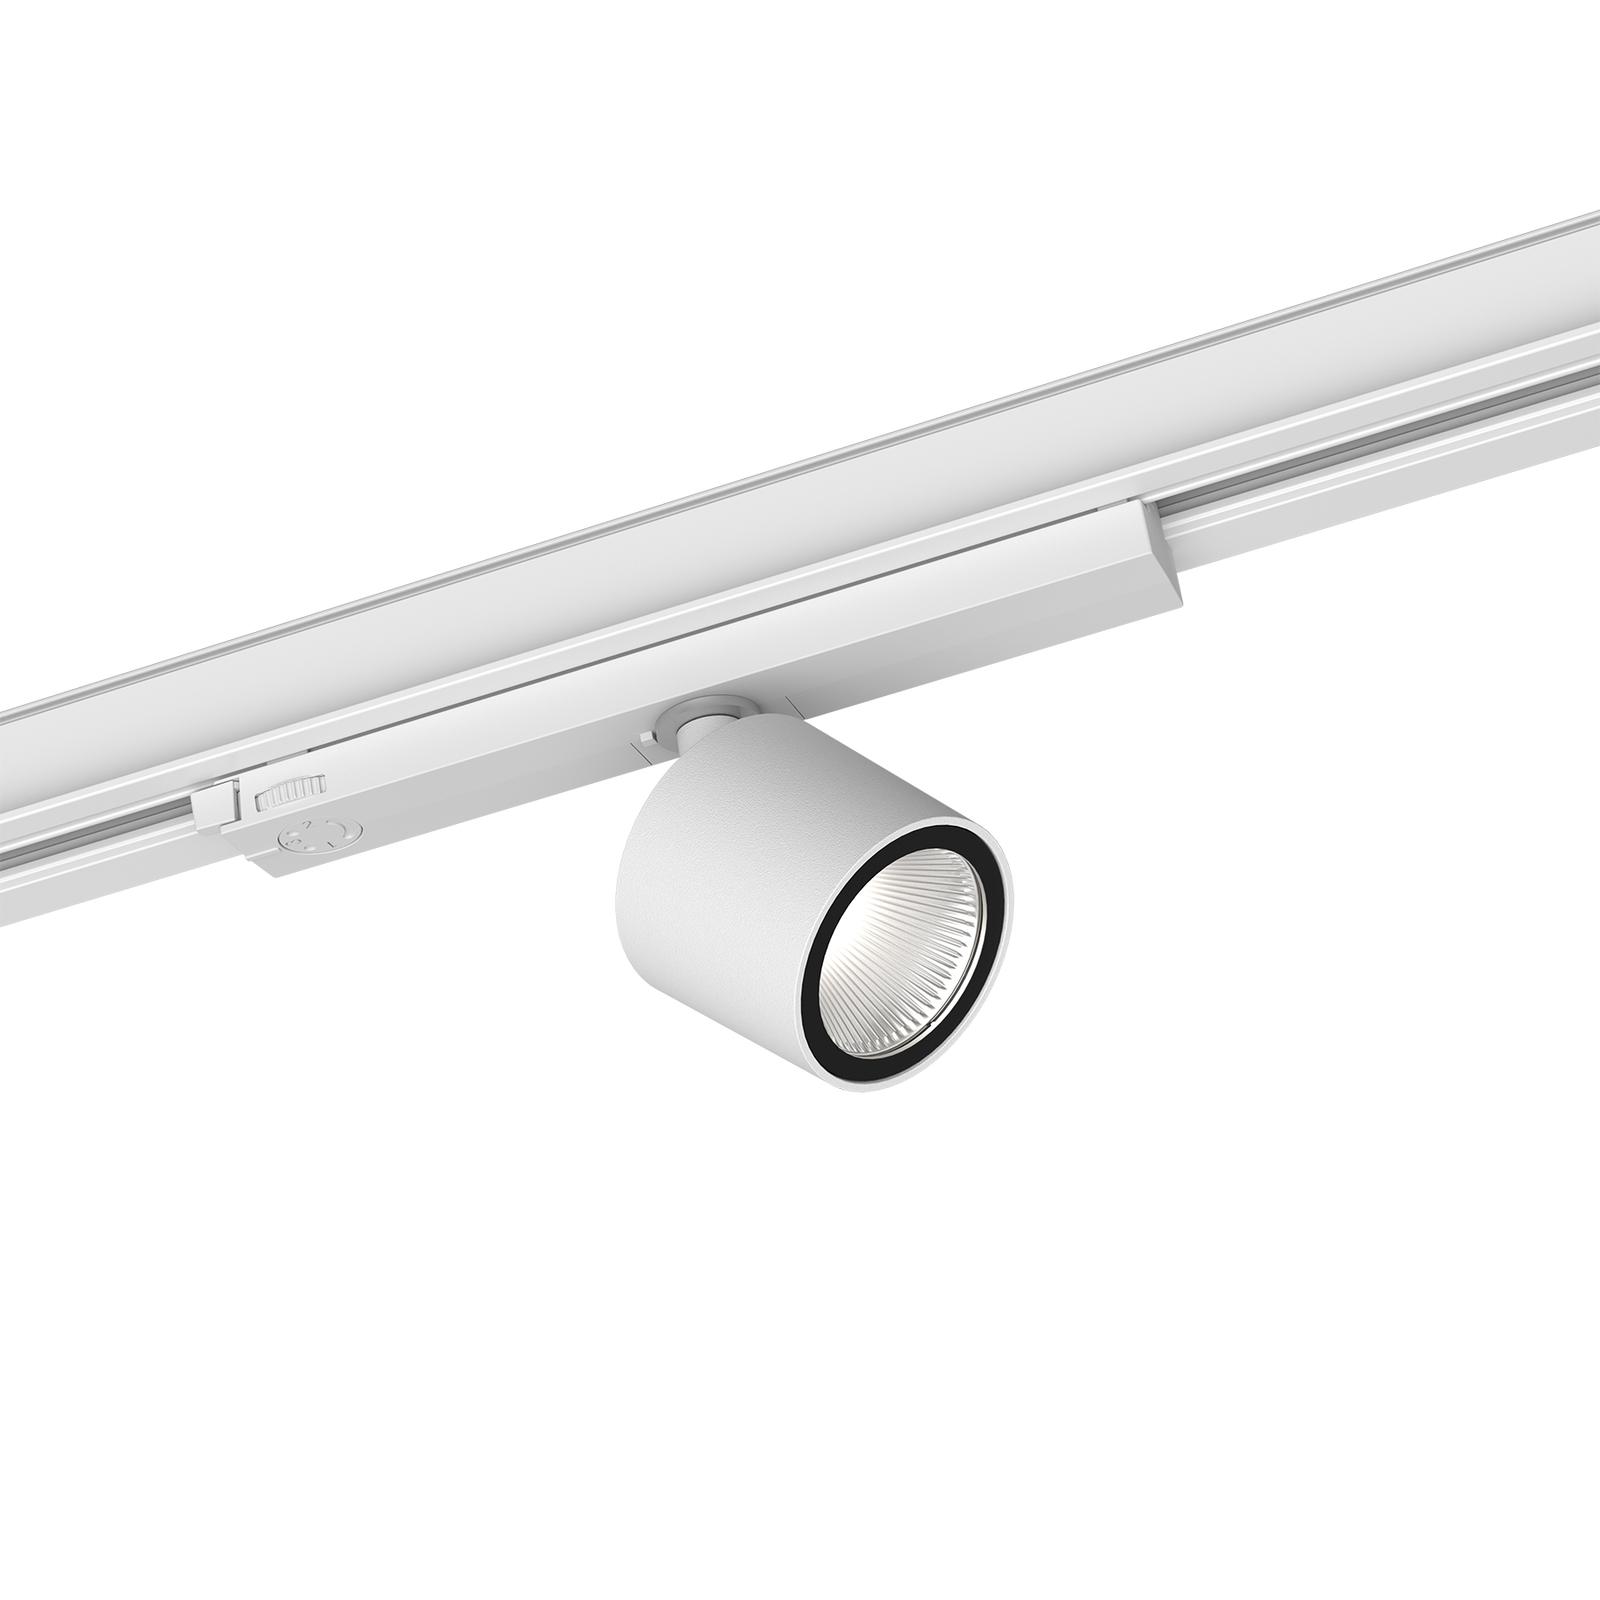 3-Phasen LED-Strahler Oryo on/off weiß 940 45° 20W